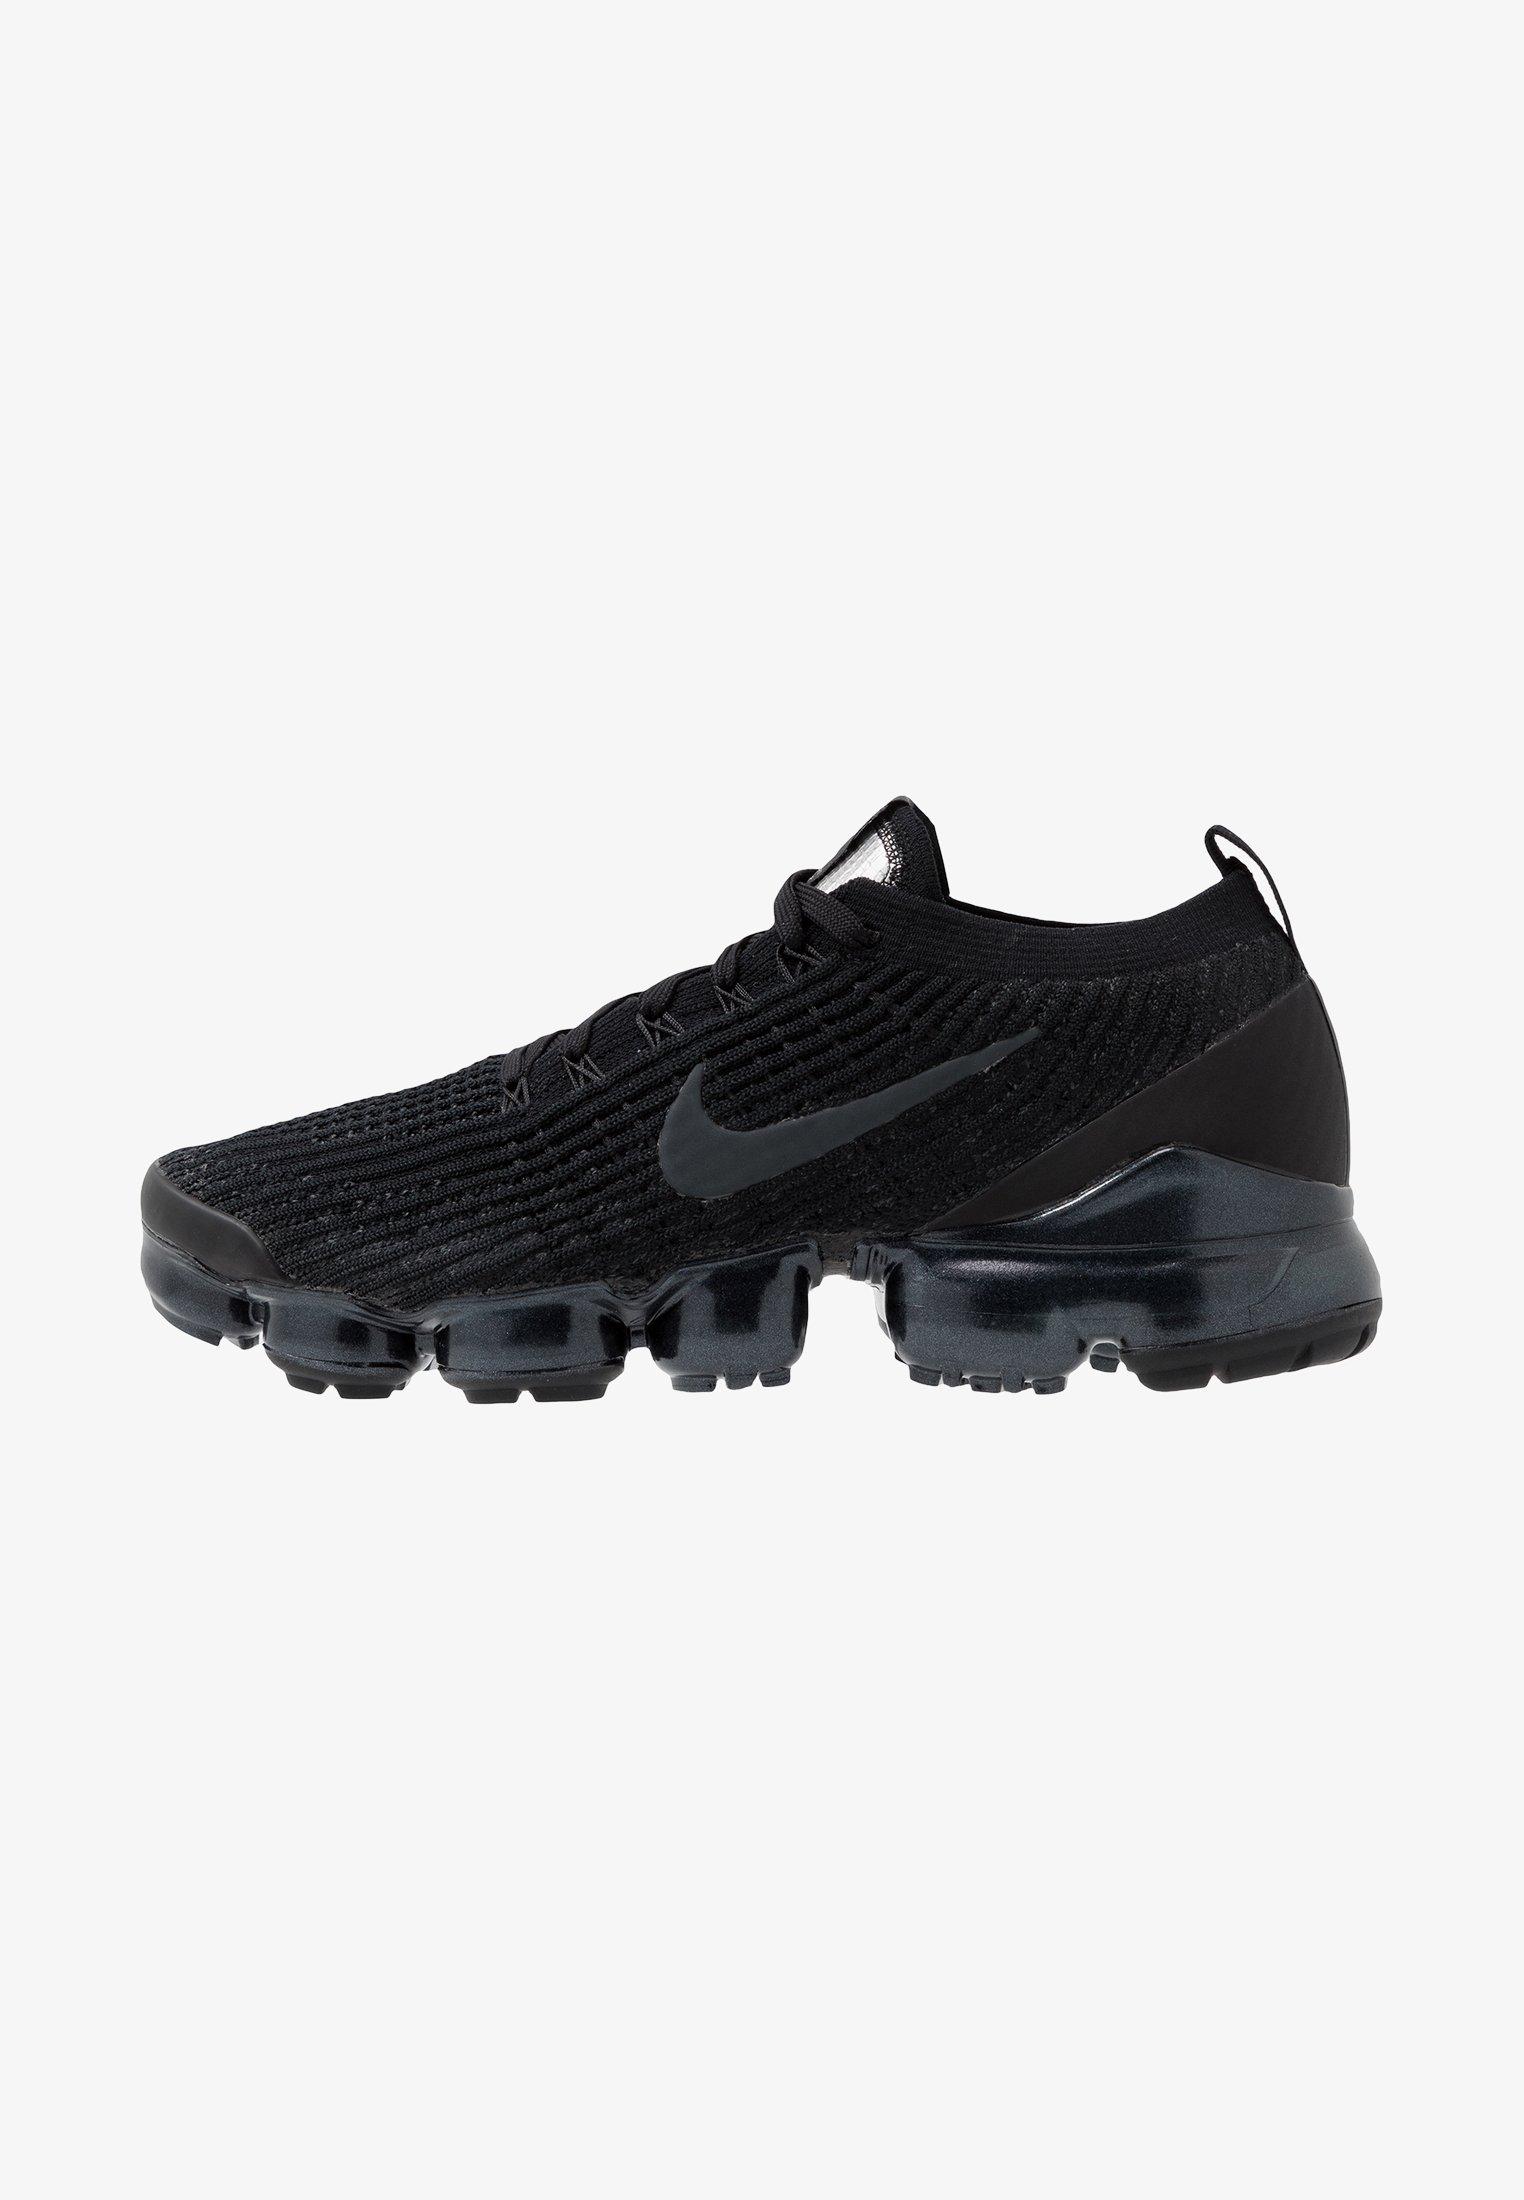 obesidad cordura lente  Nike Sportswear AIR VAPORMAX FLYKNIT - Trainers -  black/anthracite/white/metallic silver - Zalando.de